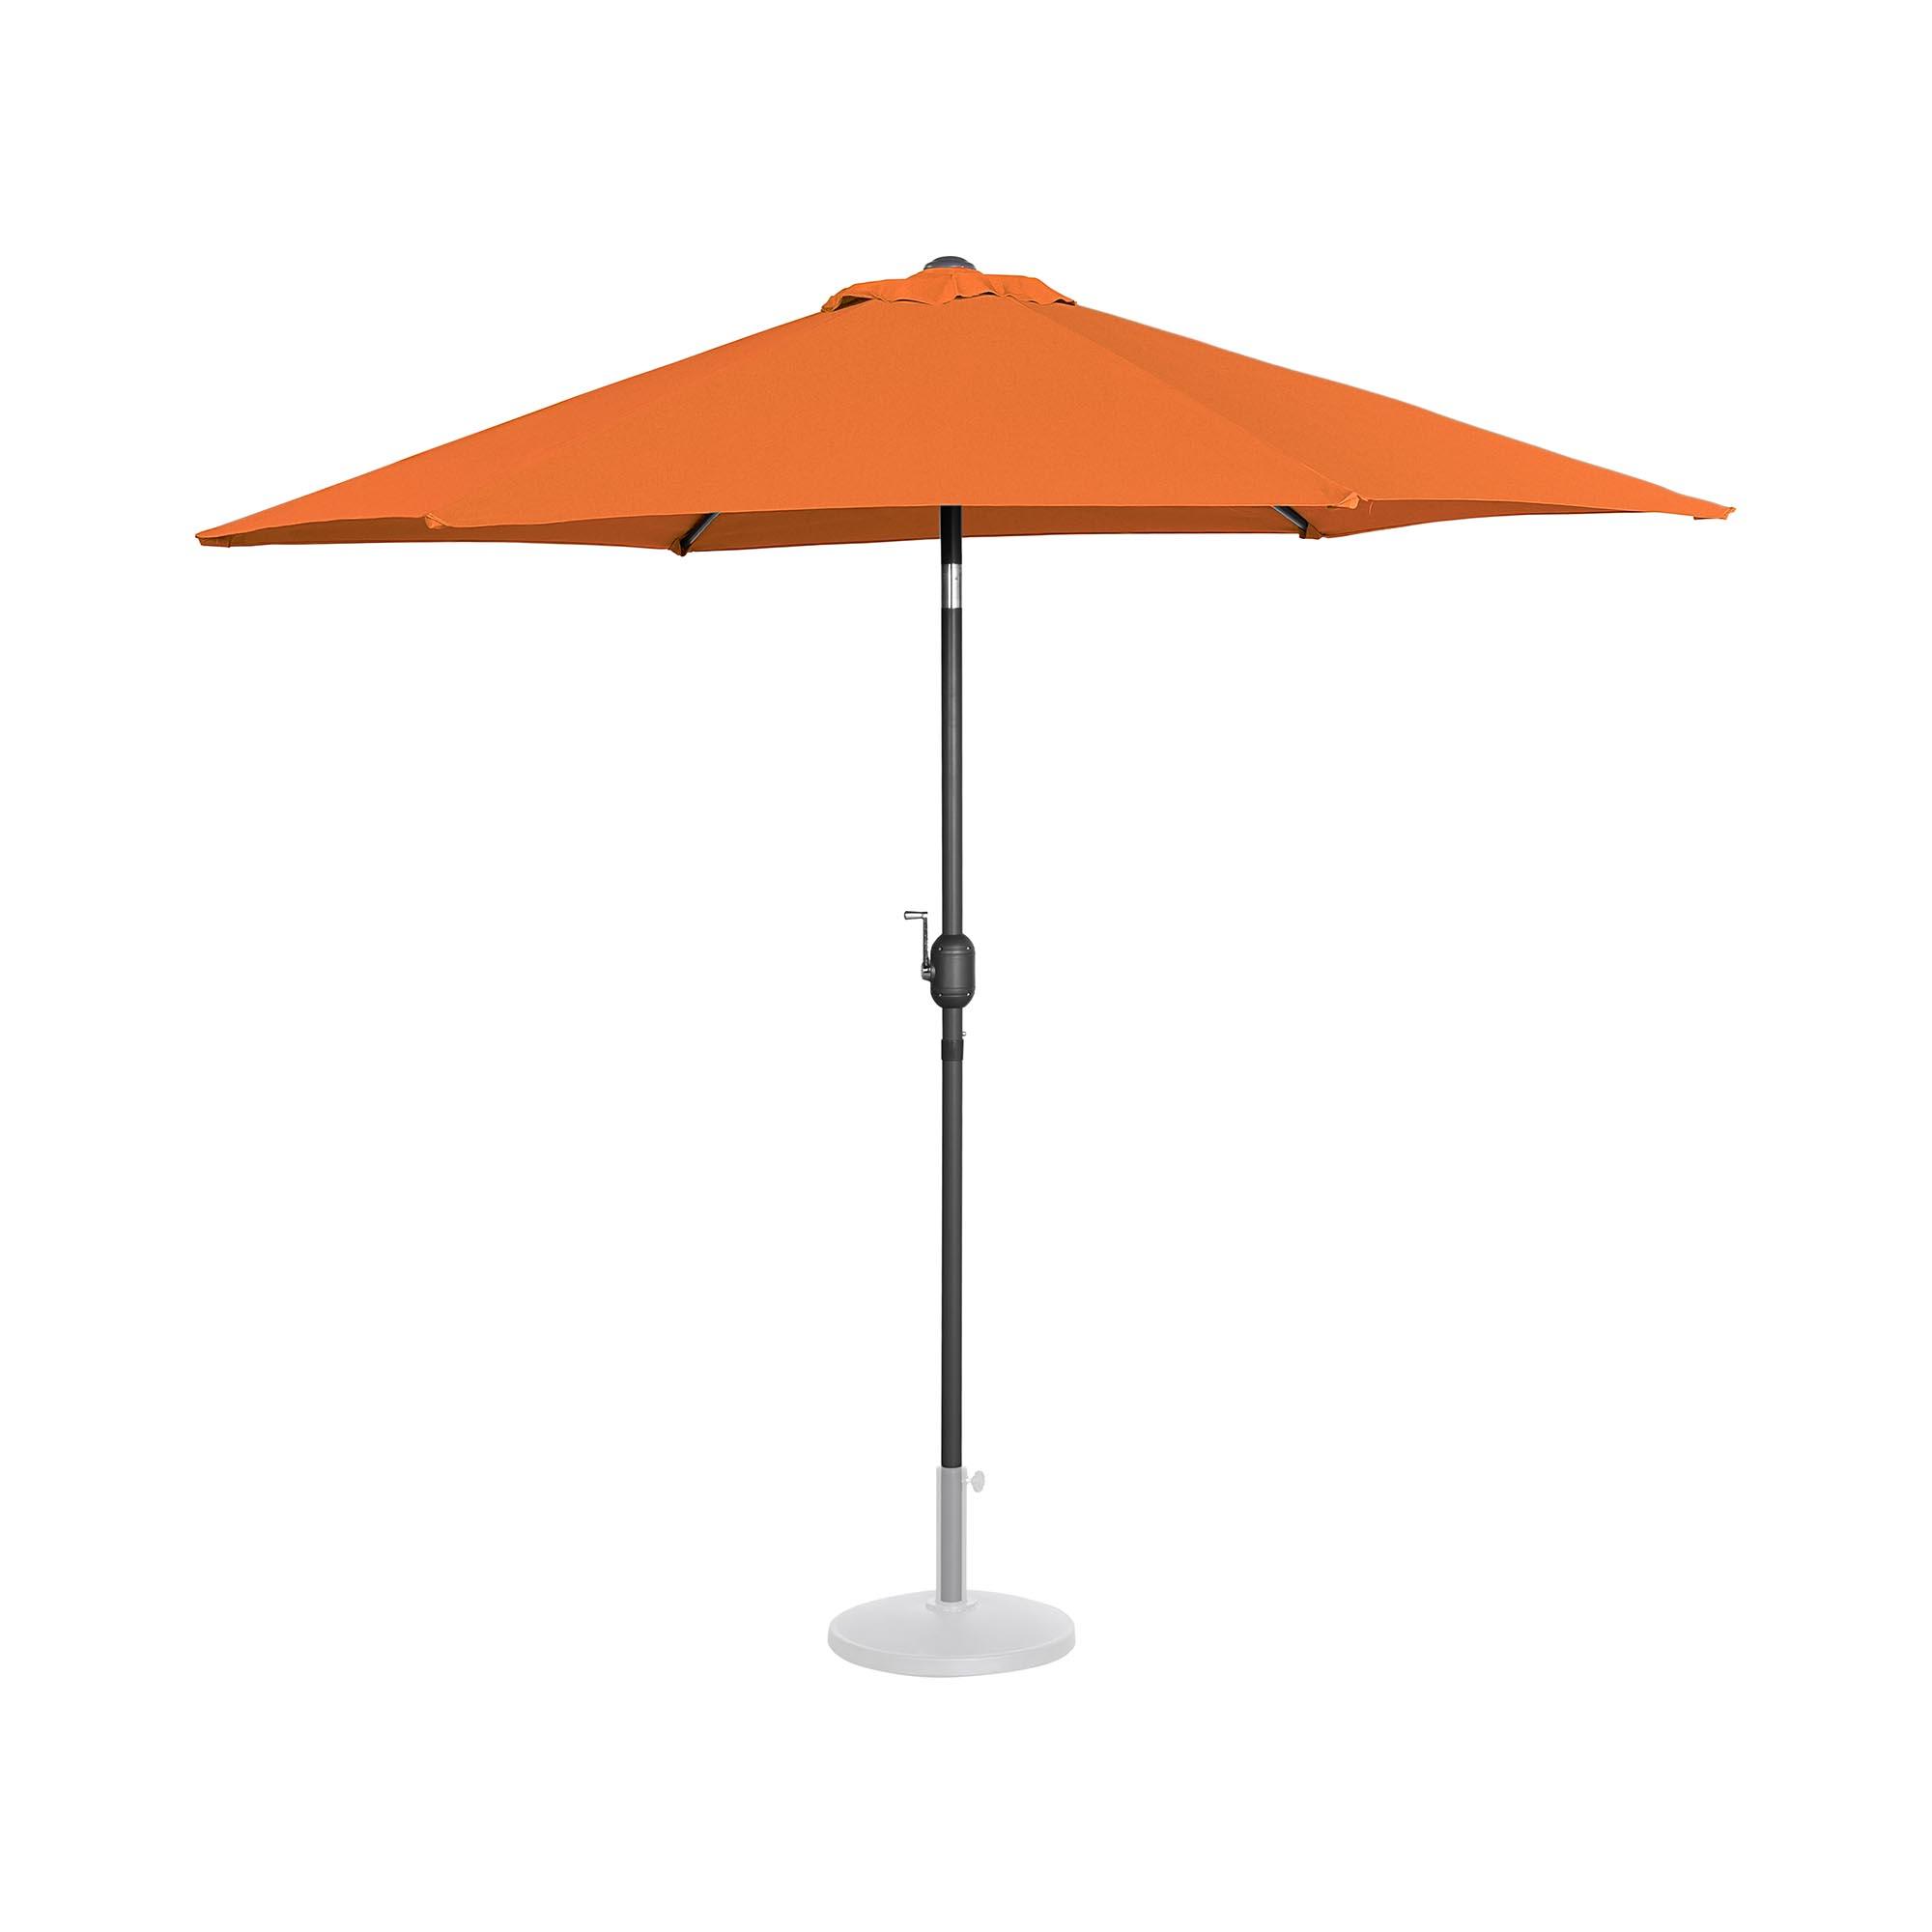 Uniprodo Sonnenschirm groß - orange - sechseckig - Ø 270 cm - neigbar UNI_UMBRELLA_R270OR